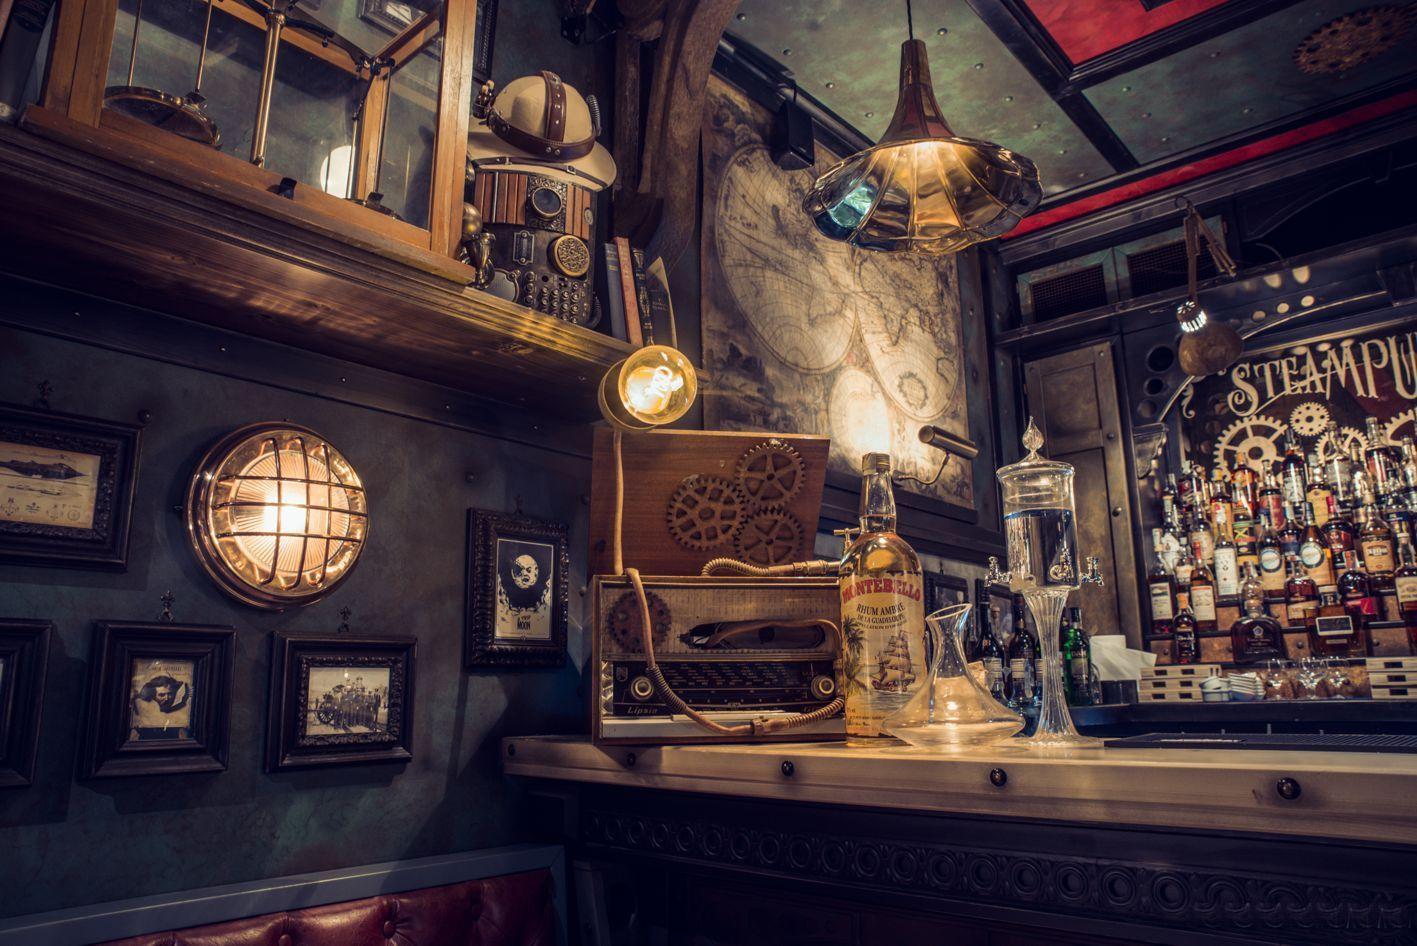 Camproject srl arredo pub arredamenti arredi per irish for Arredamento english